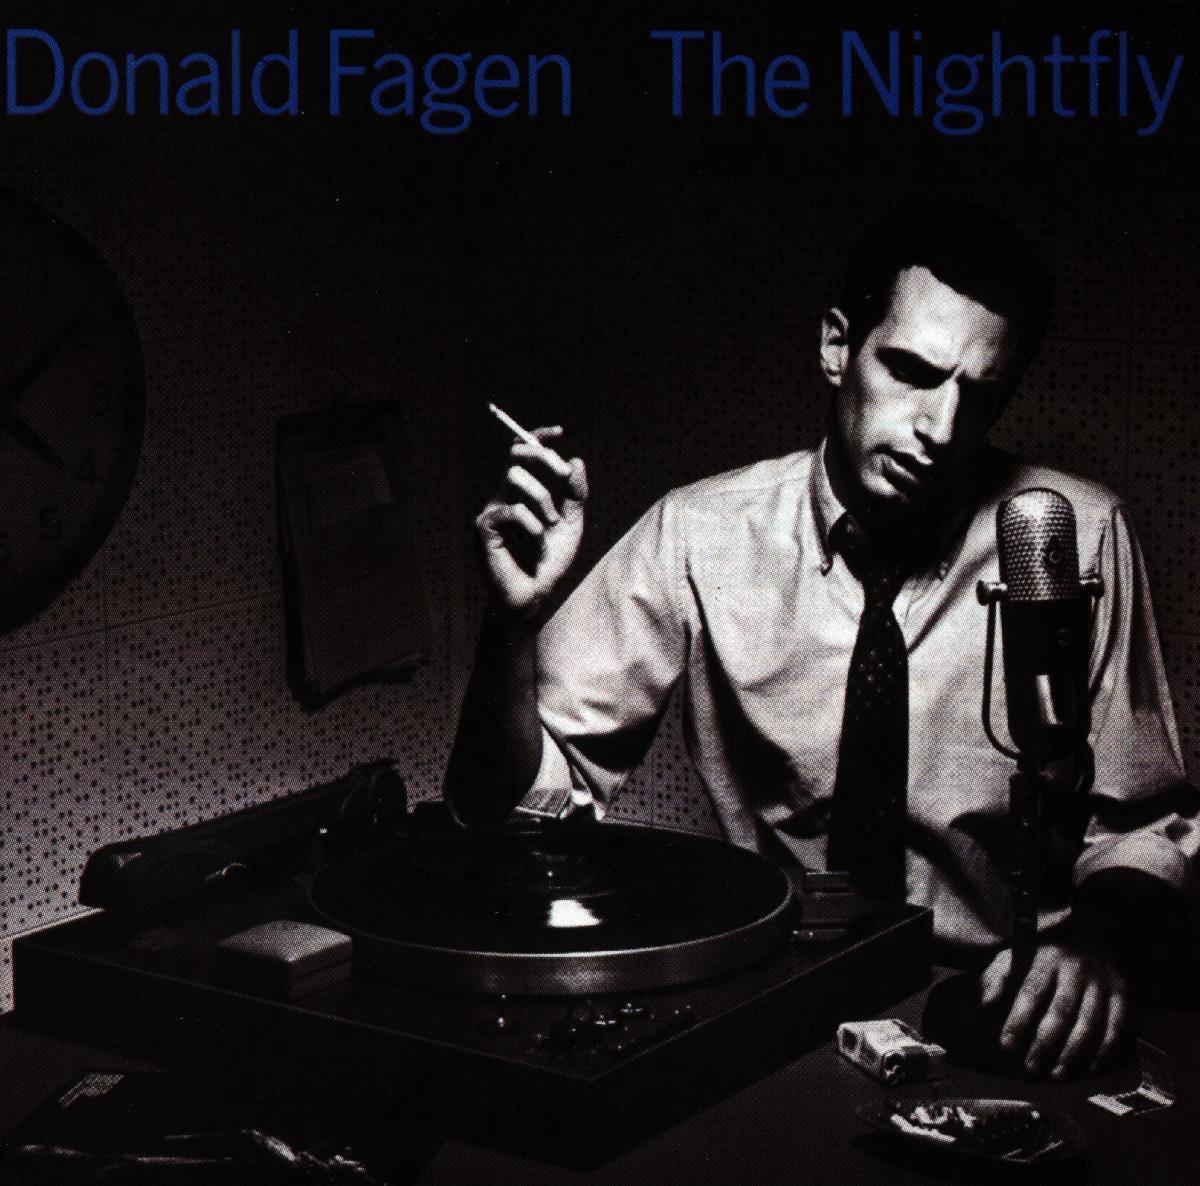 Nightfly - Donald Fagen